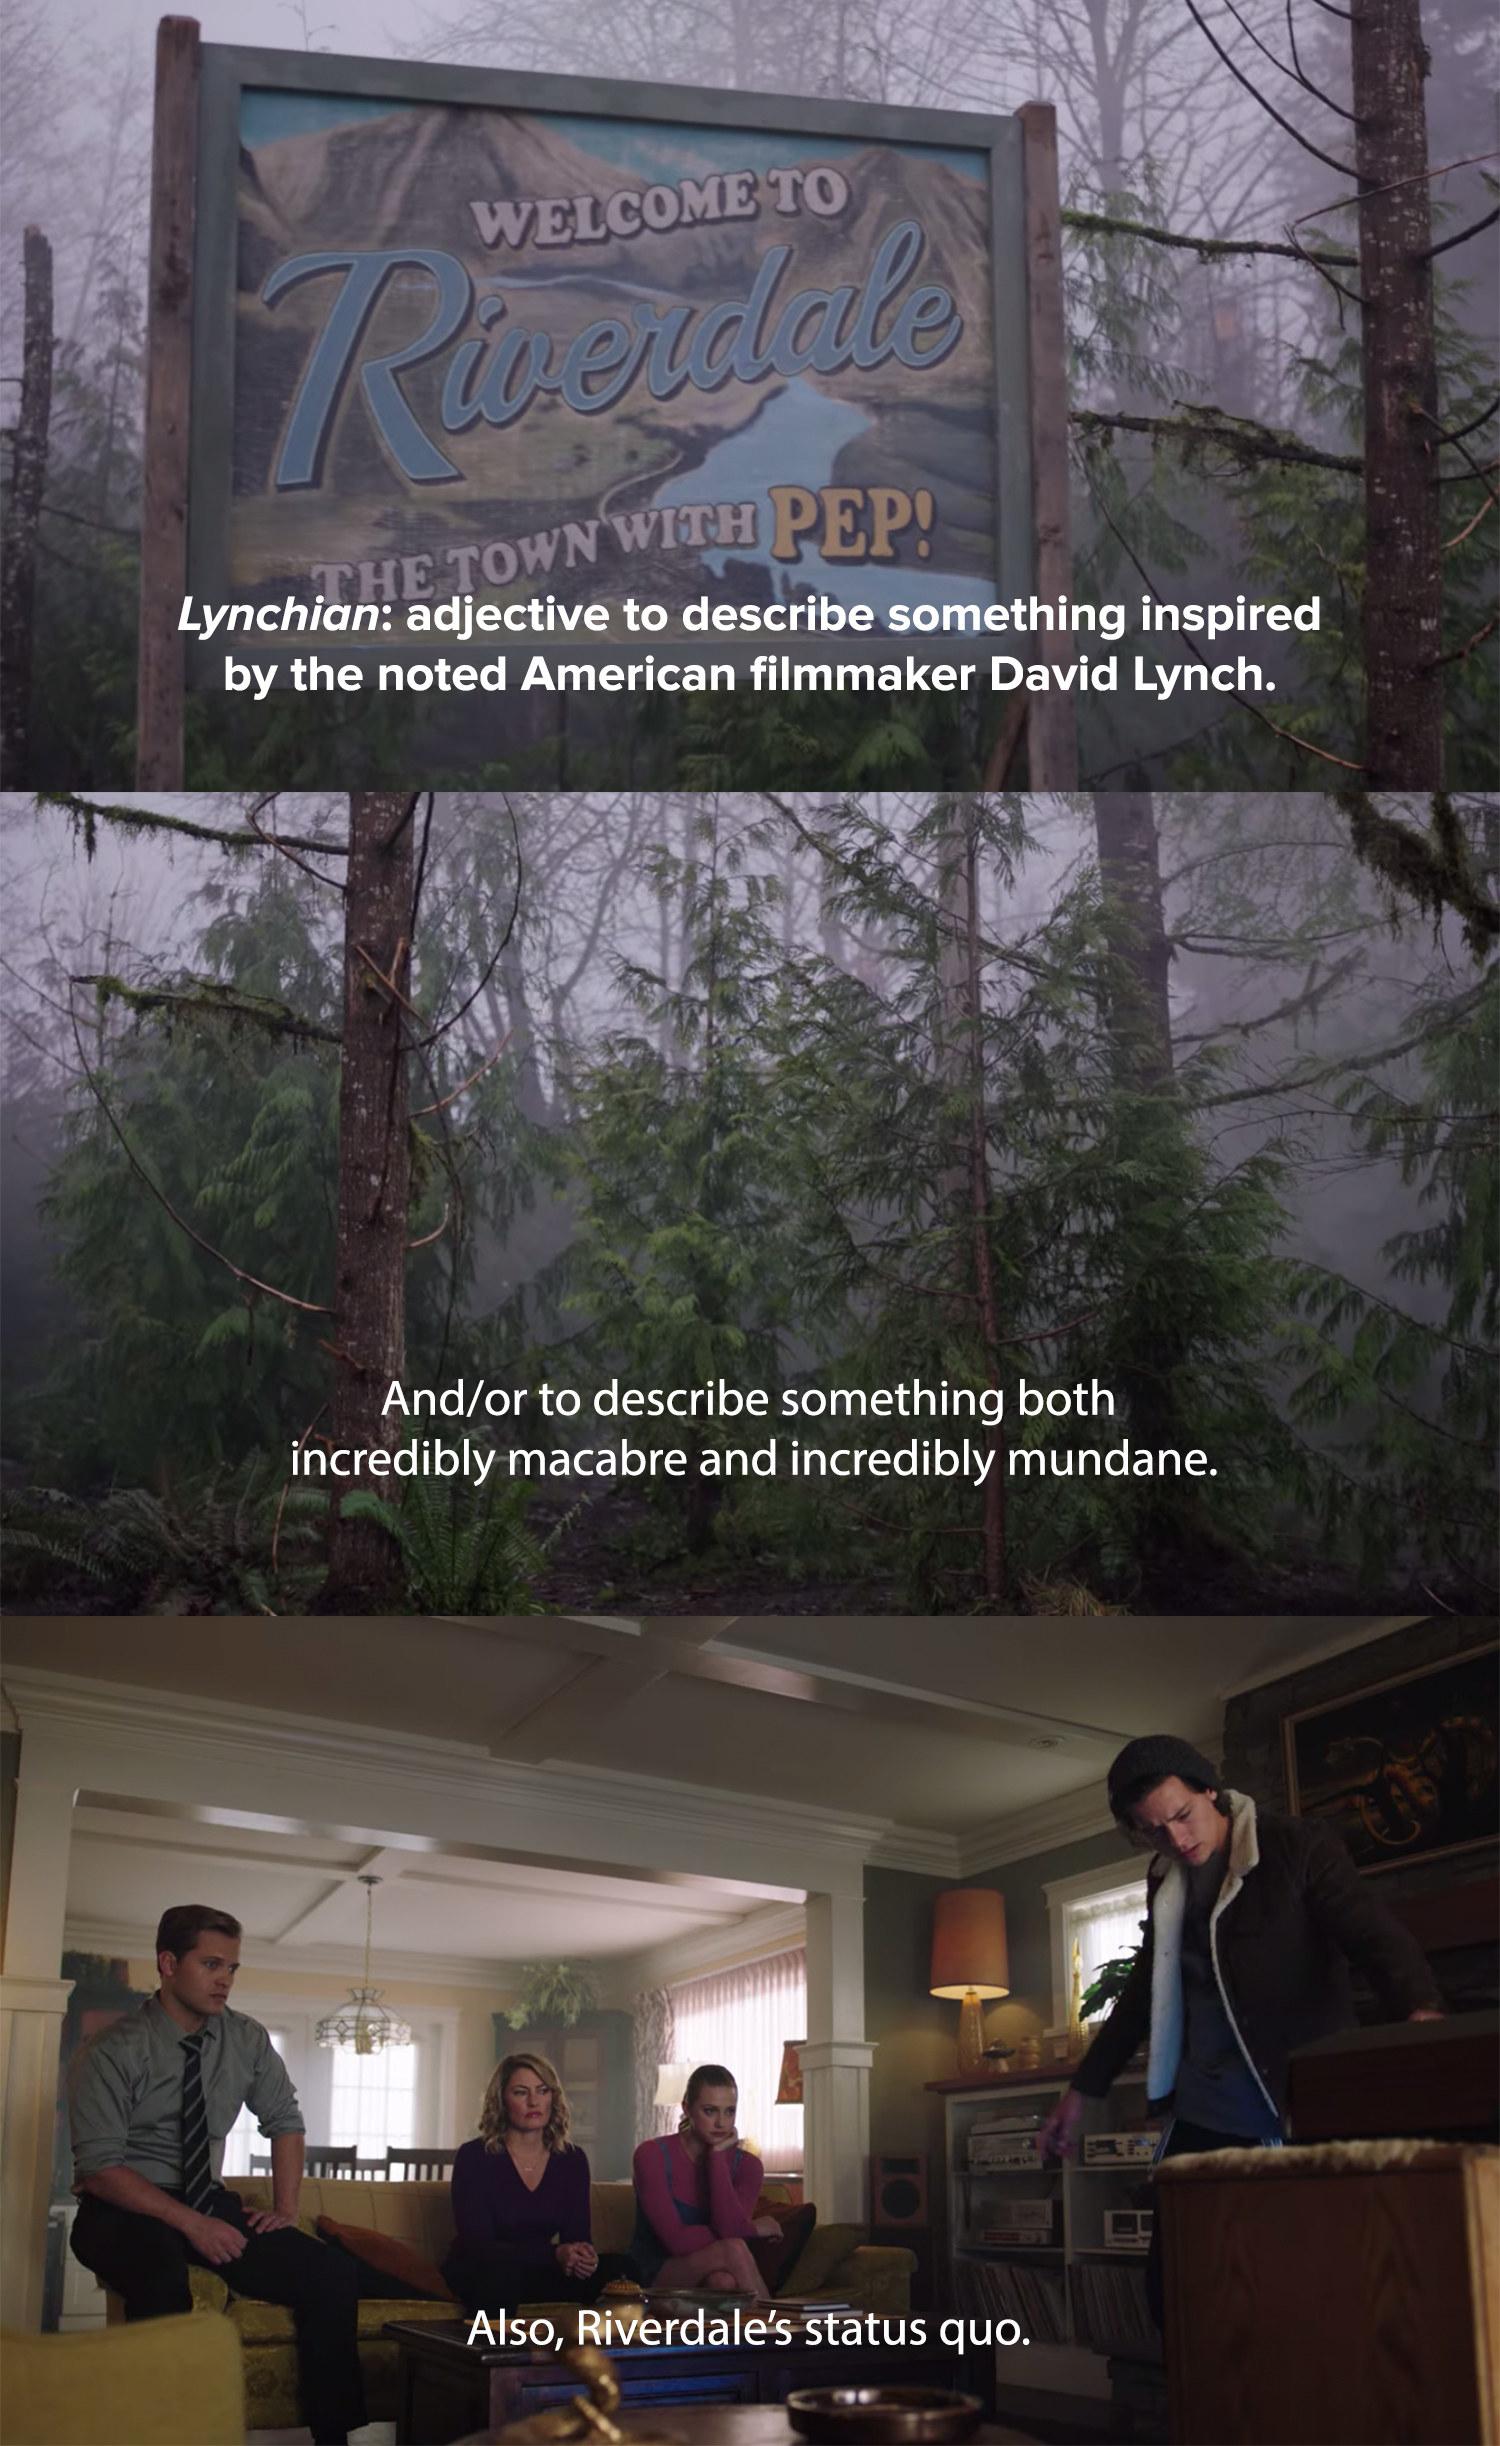 Jughead describes Riverdale as both incredibly macabre and incredibly mundane